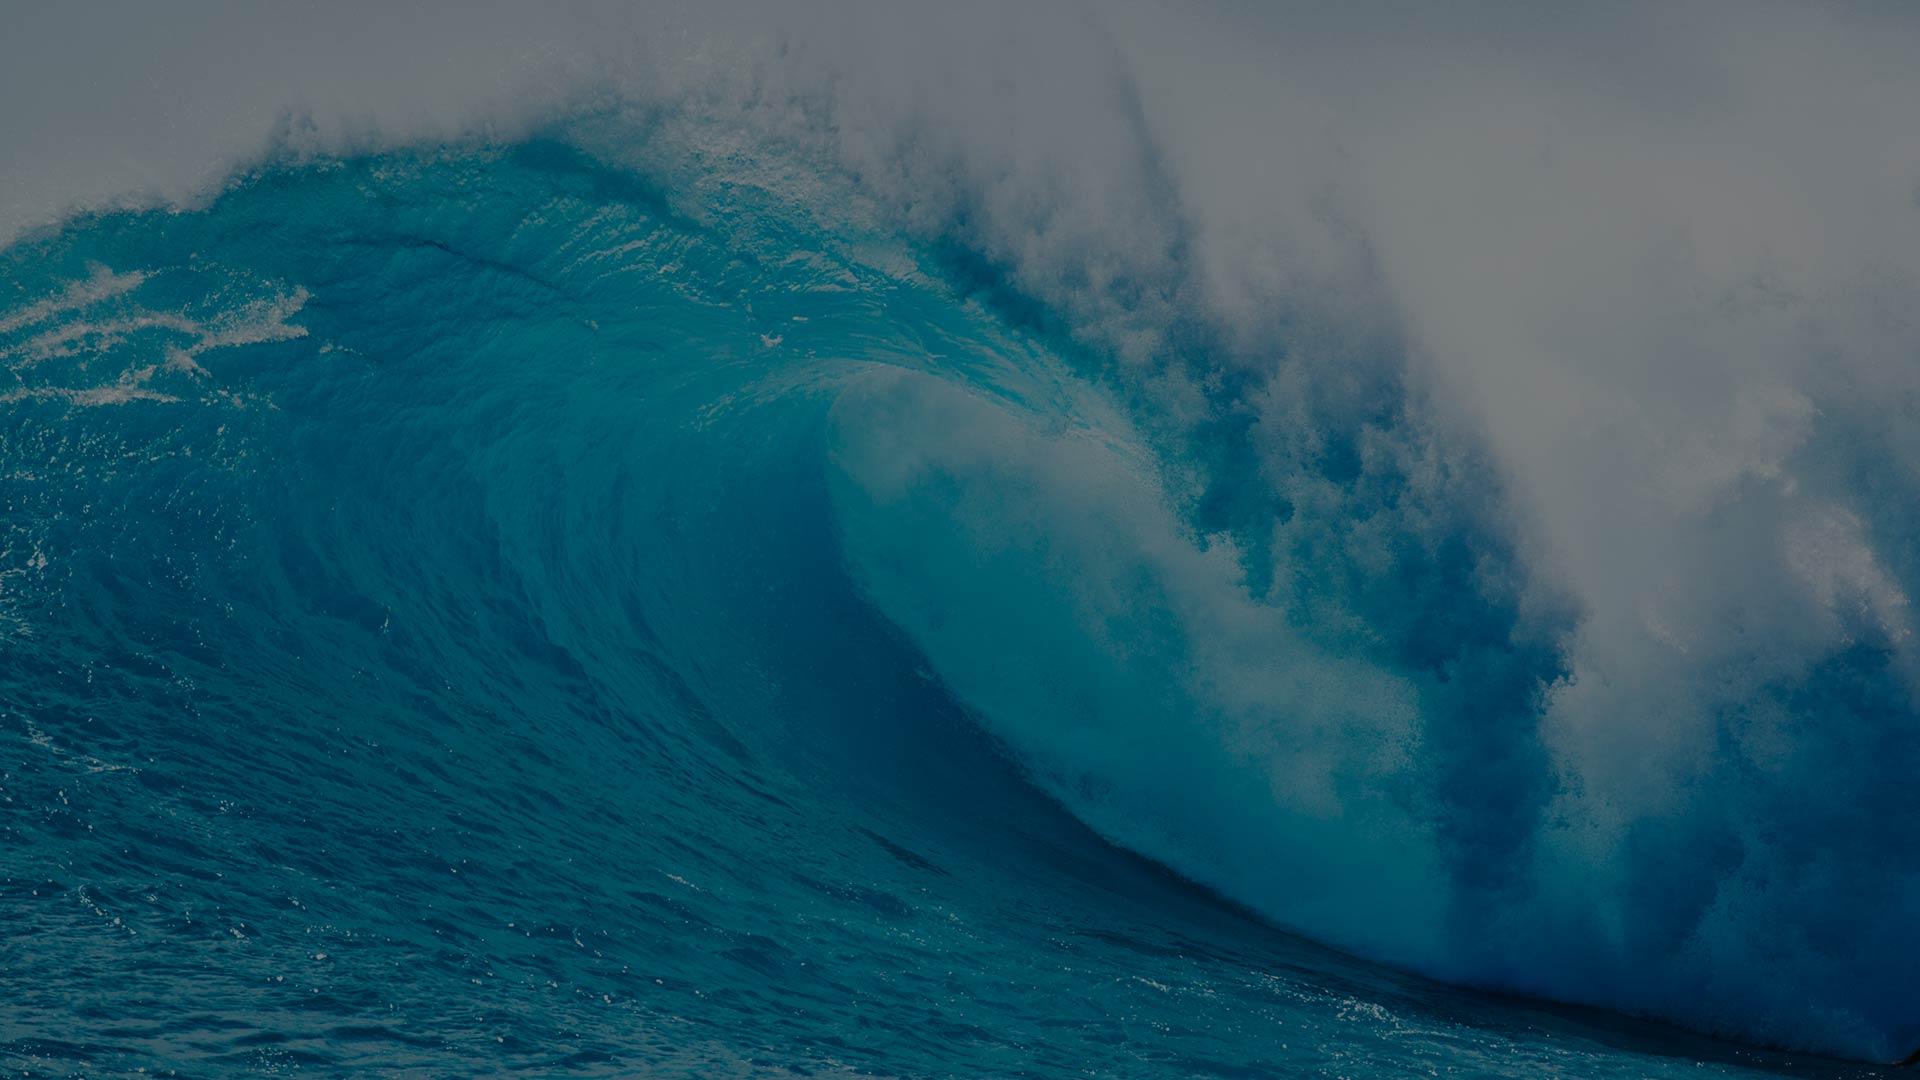 vertigo-laybuy-wave